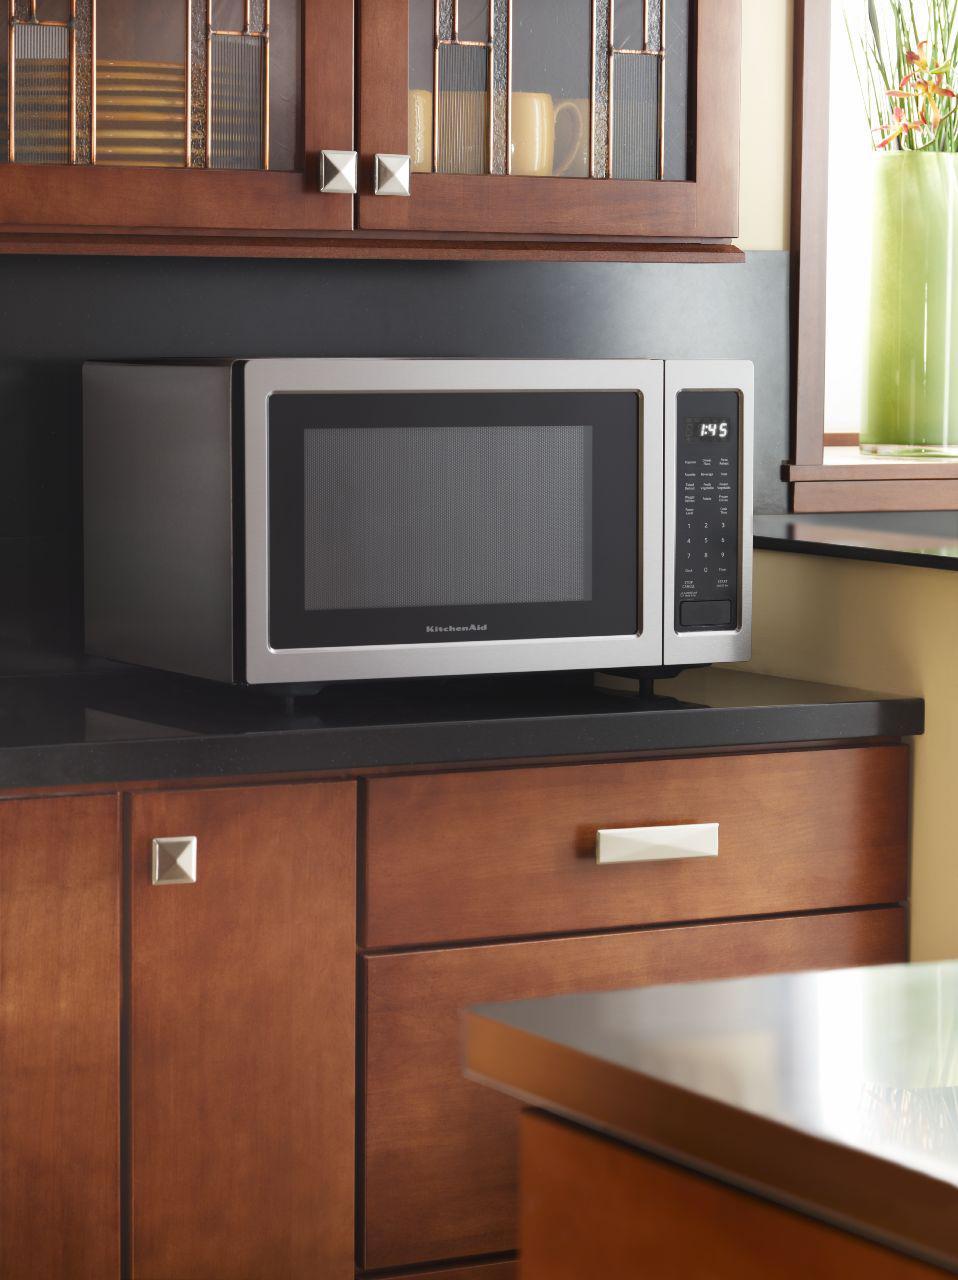 ... KitchenAid Microwaves   Kitchenaid2.2 Cu. Ft. Countertop Microwave Oven